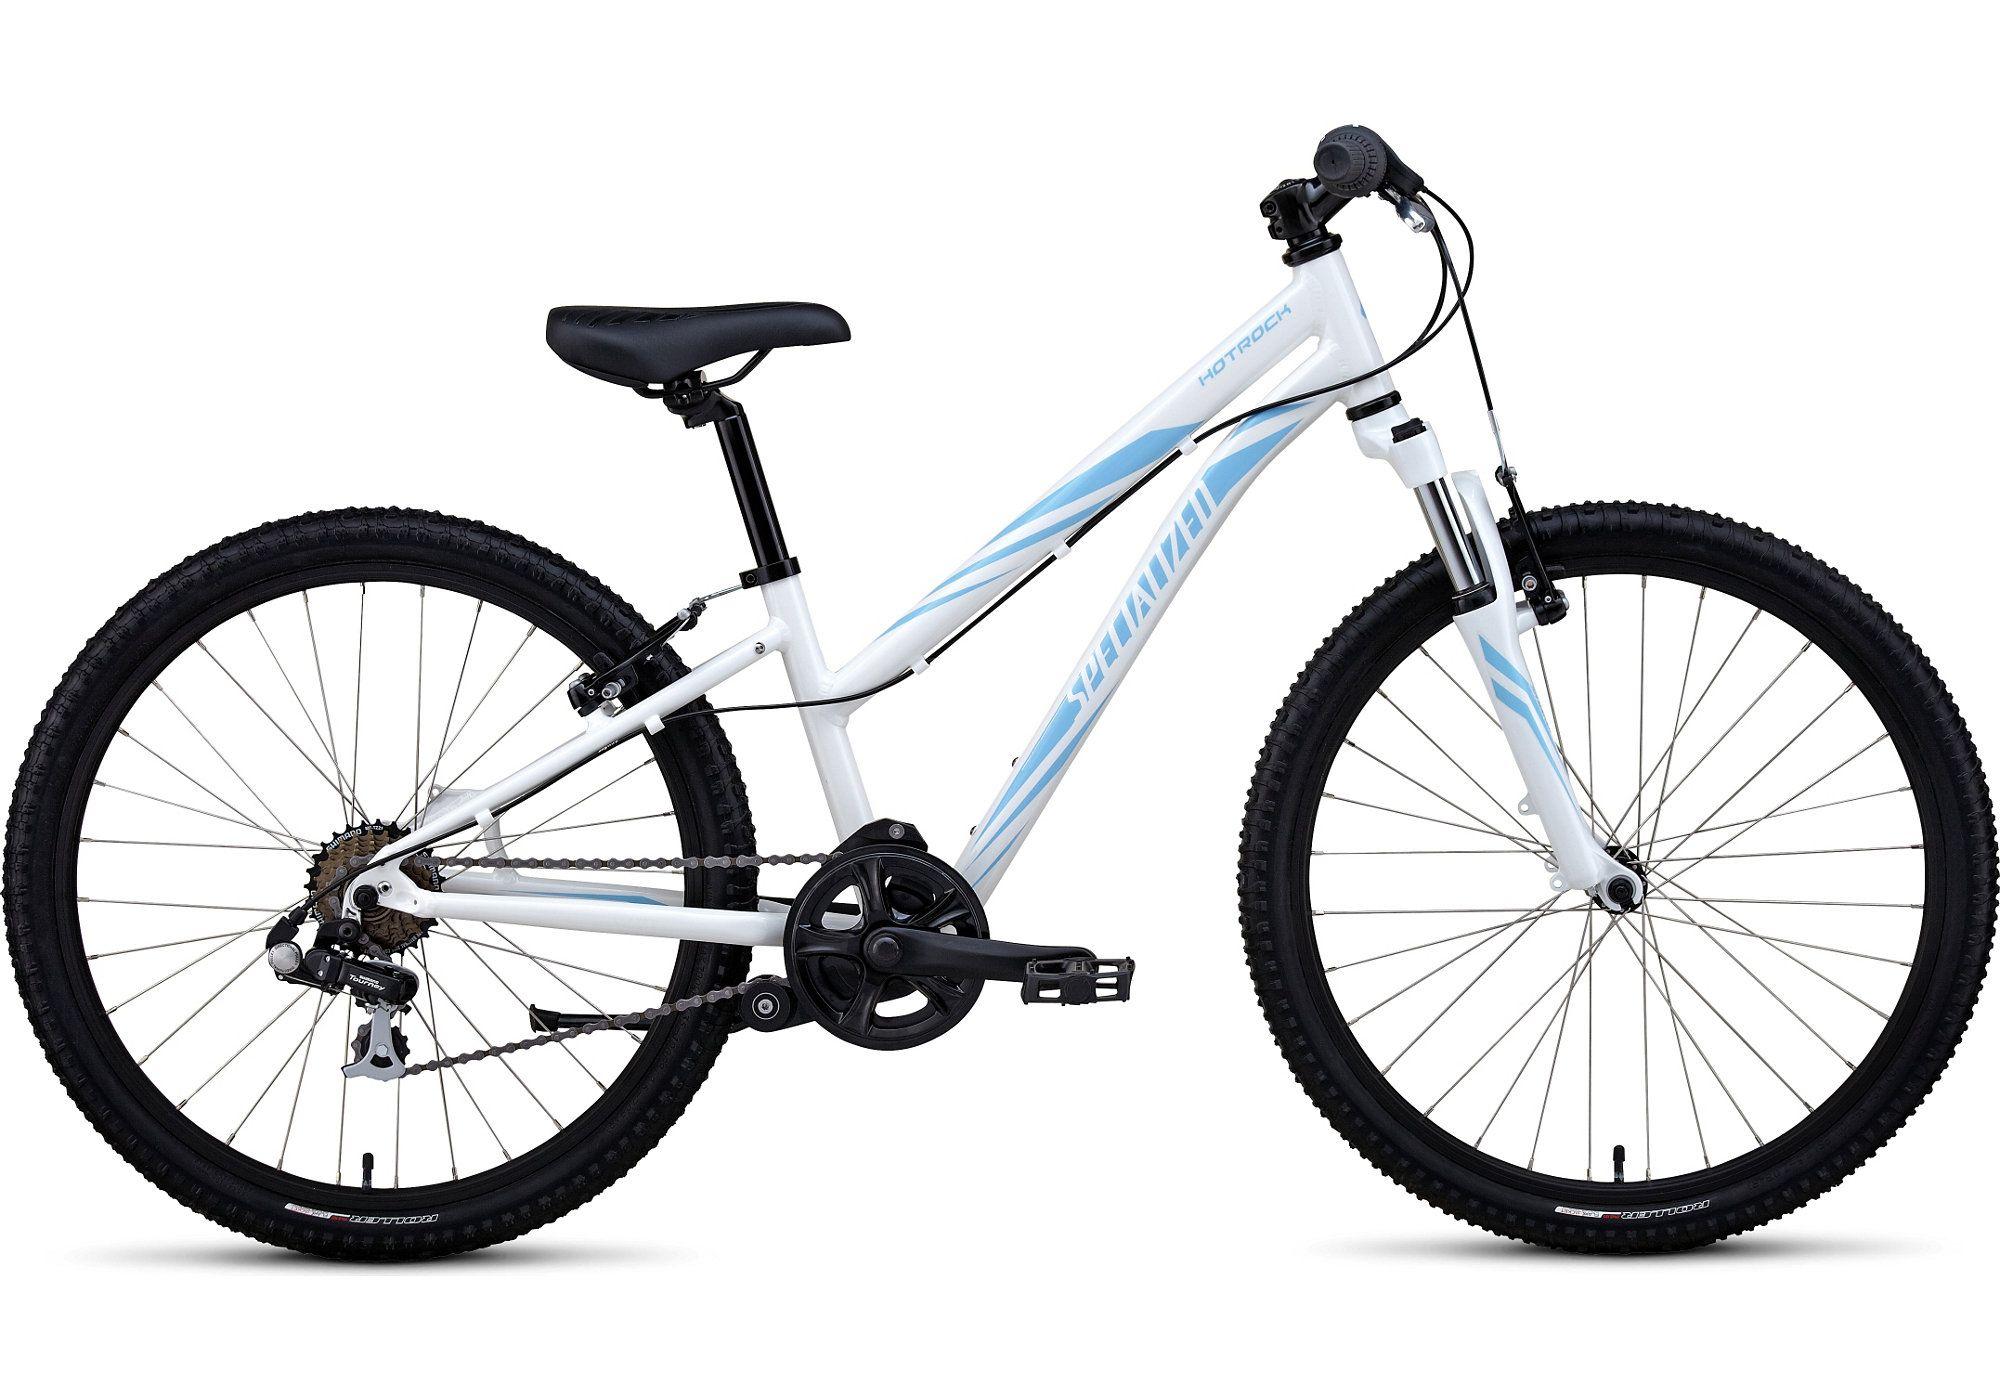 Велосипед Specialized Hotrock 24 7 speed girl 2016 велосипед pegasus piazza gent 7 sp 28 2016